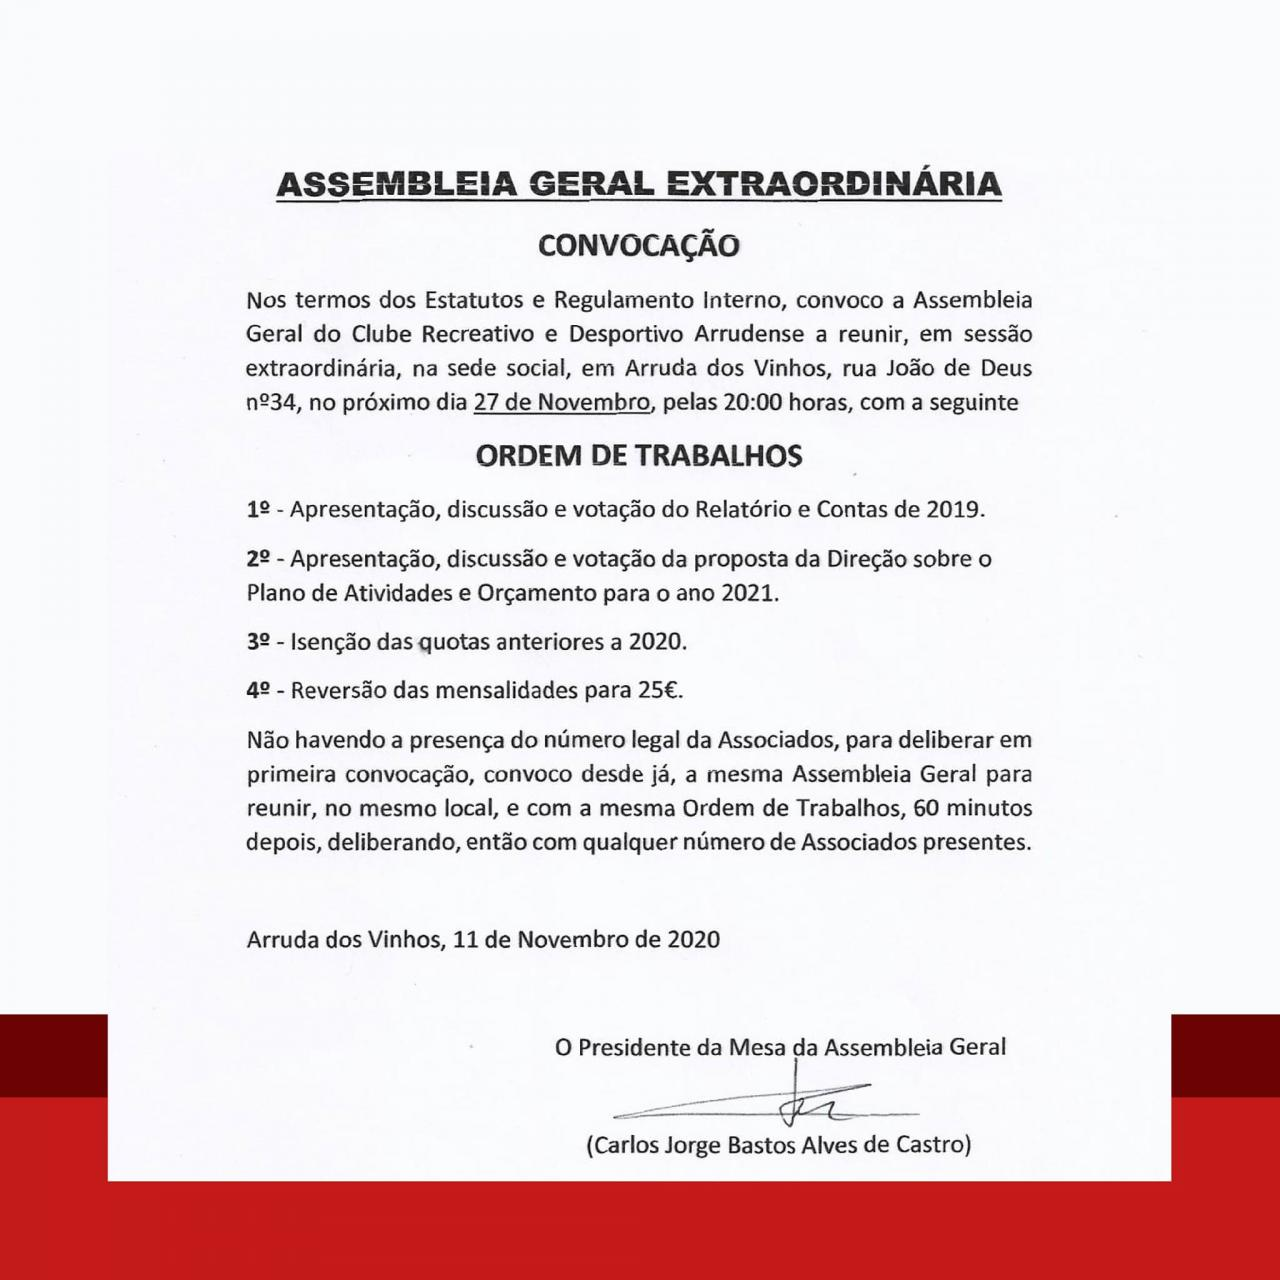 CRDA - Assembleia-geral